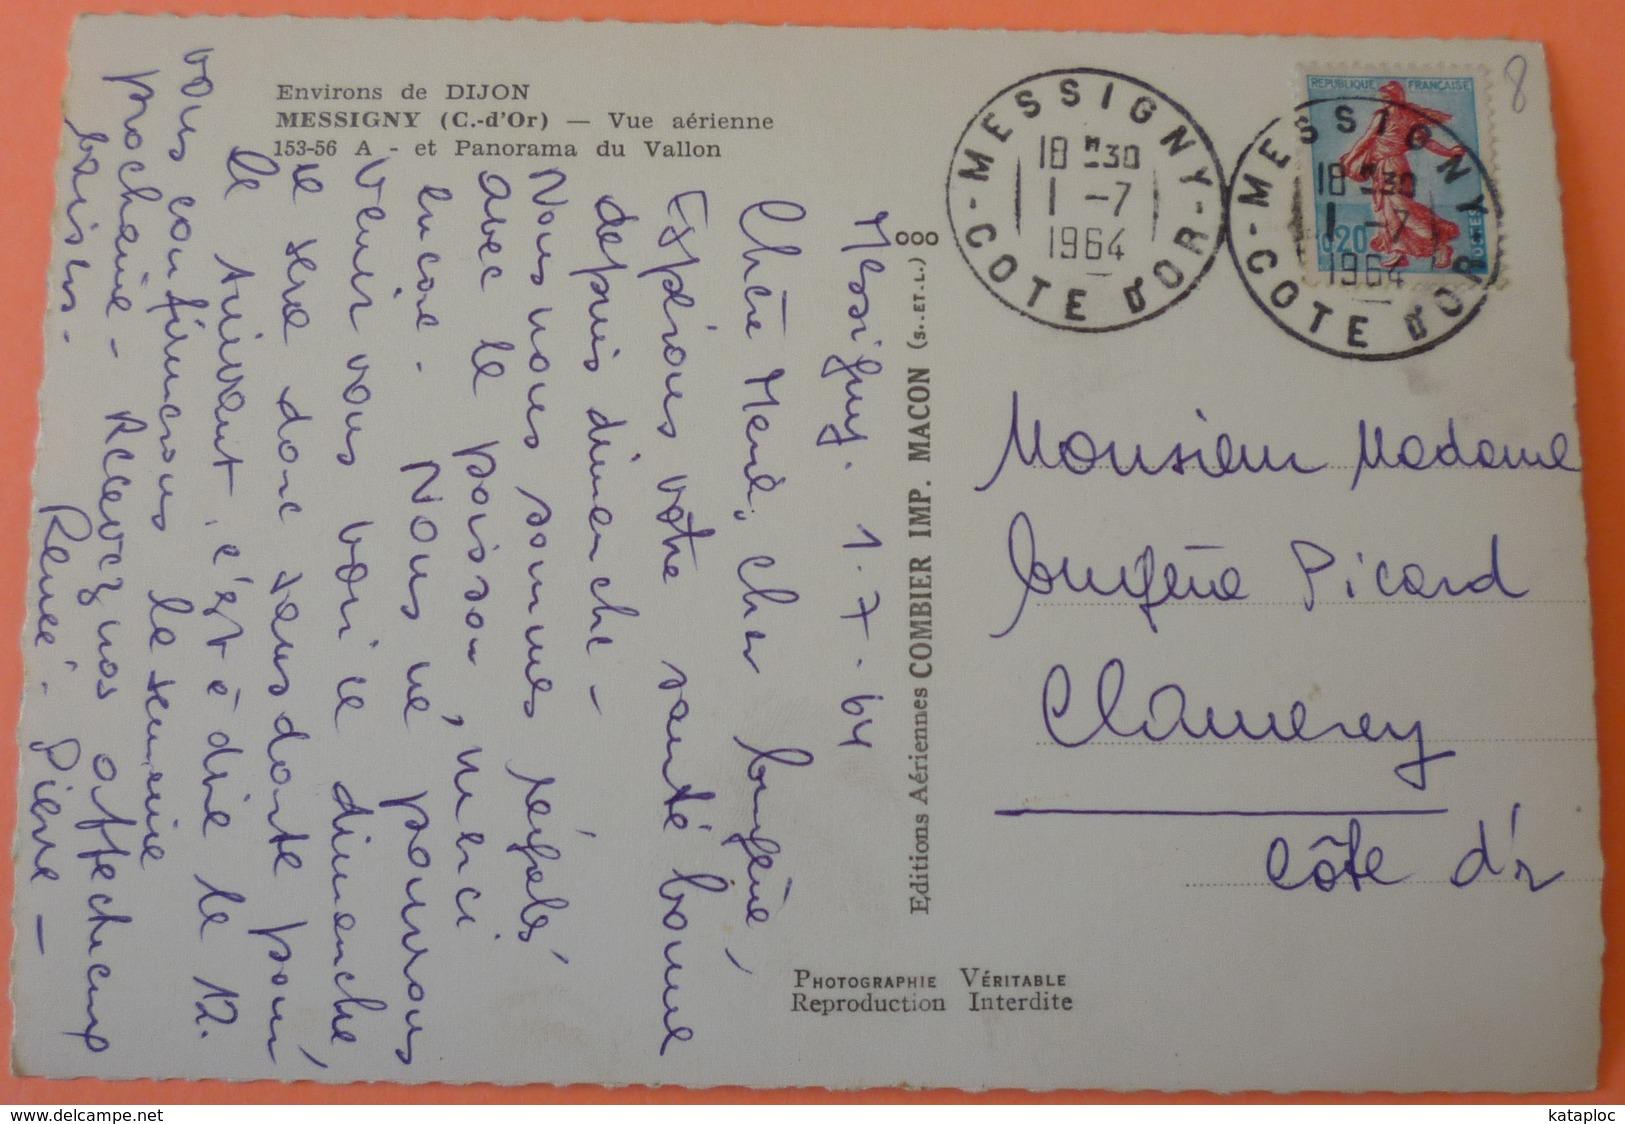 CARTE MESSIGNY - 21 - VUE AERIENNE - 1964 - SCAN RECTO/VERSO - France